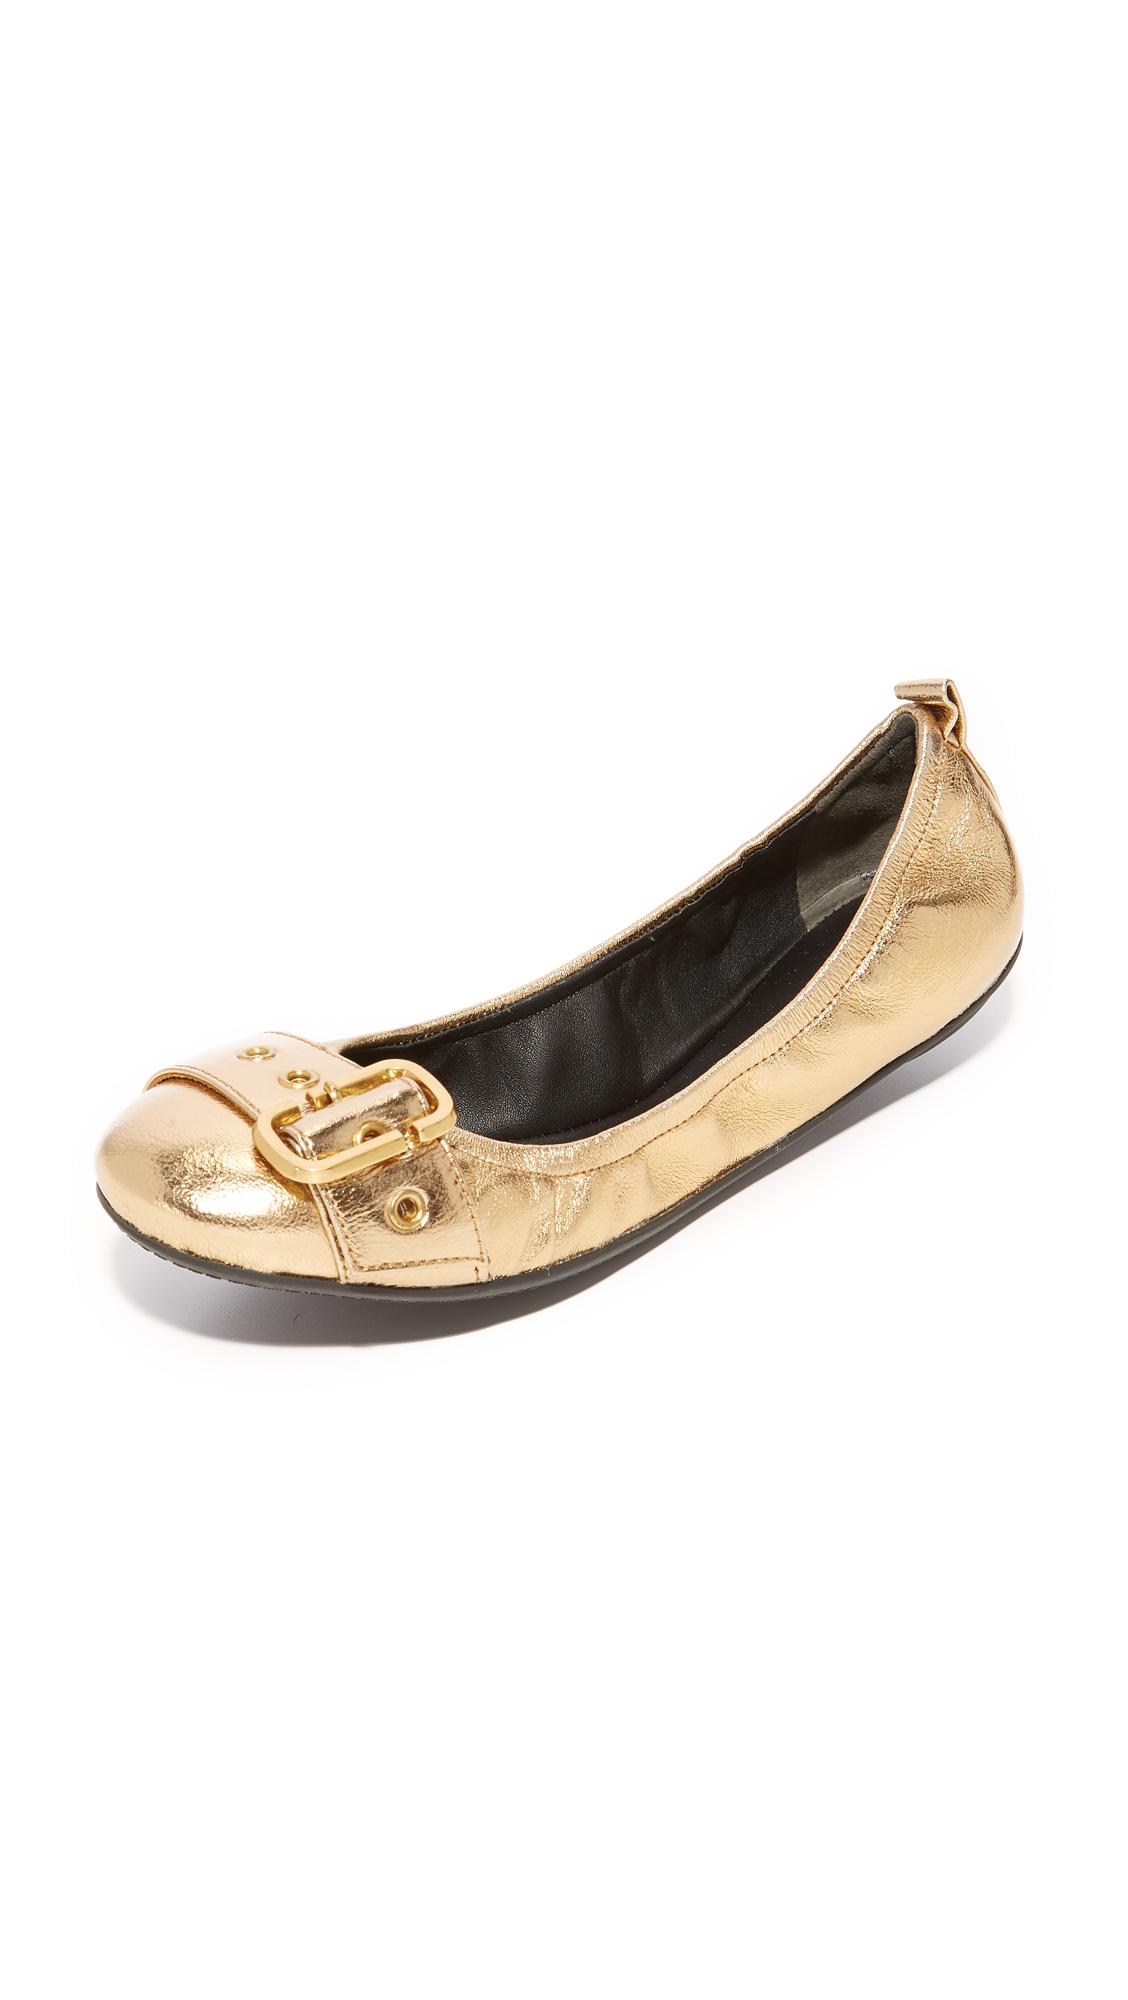 Marc Jacobs Dolly Buckle Ballerina Flats - Gold